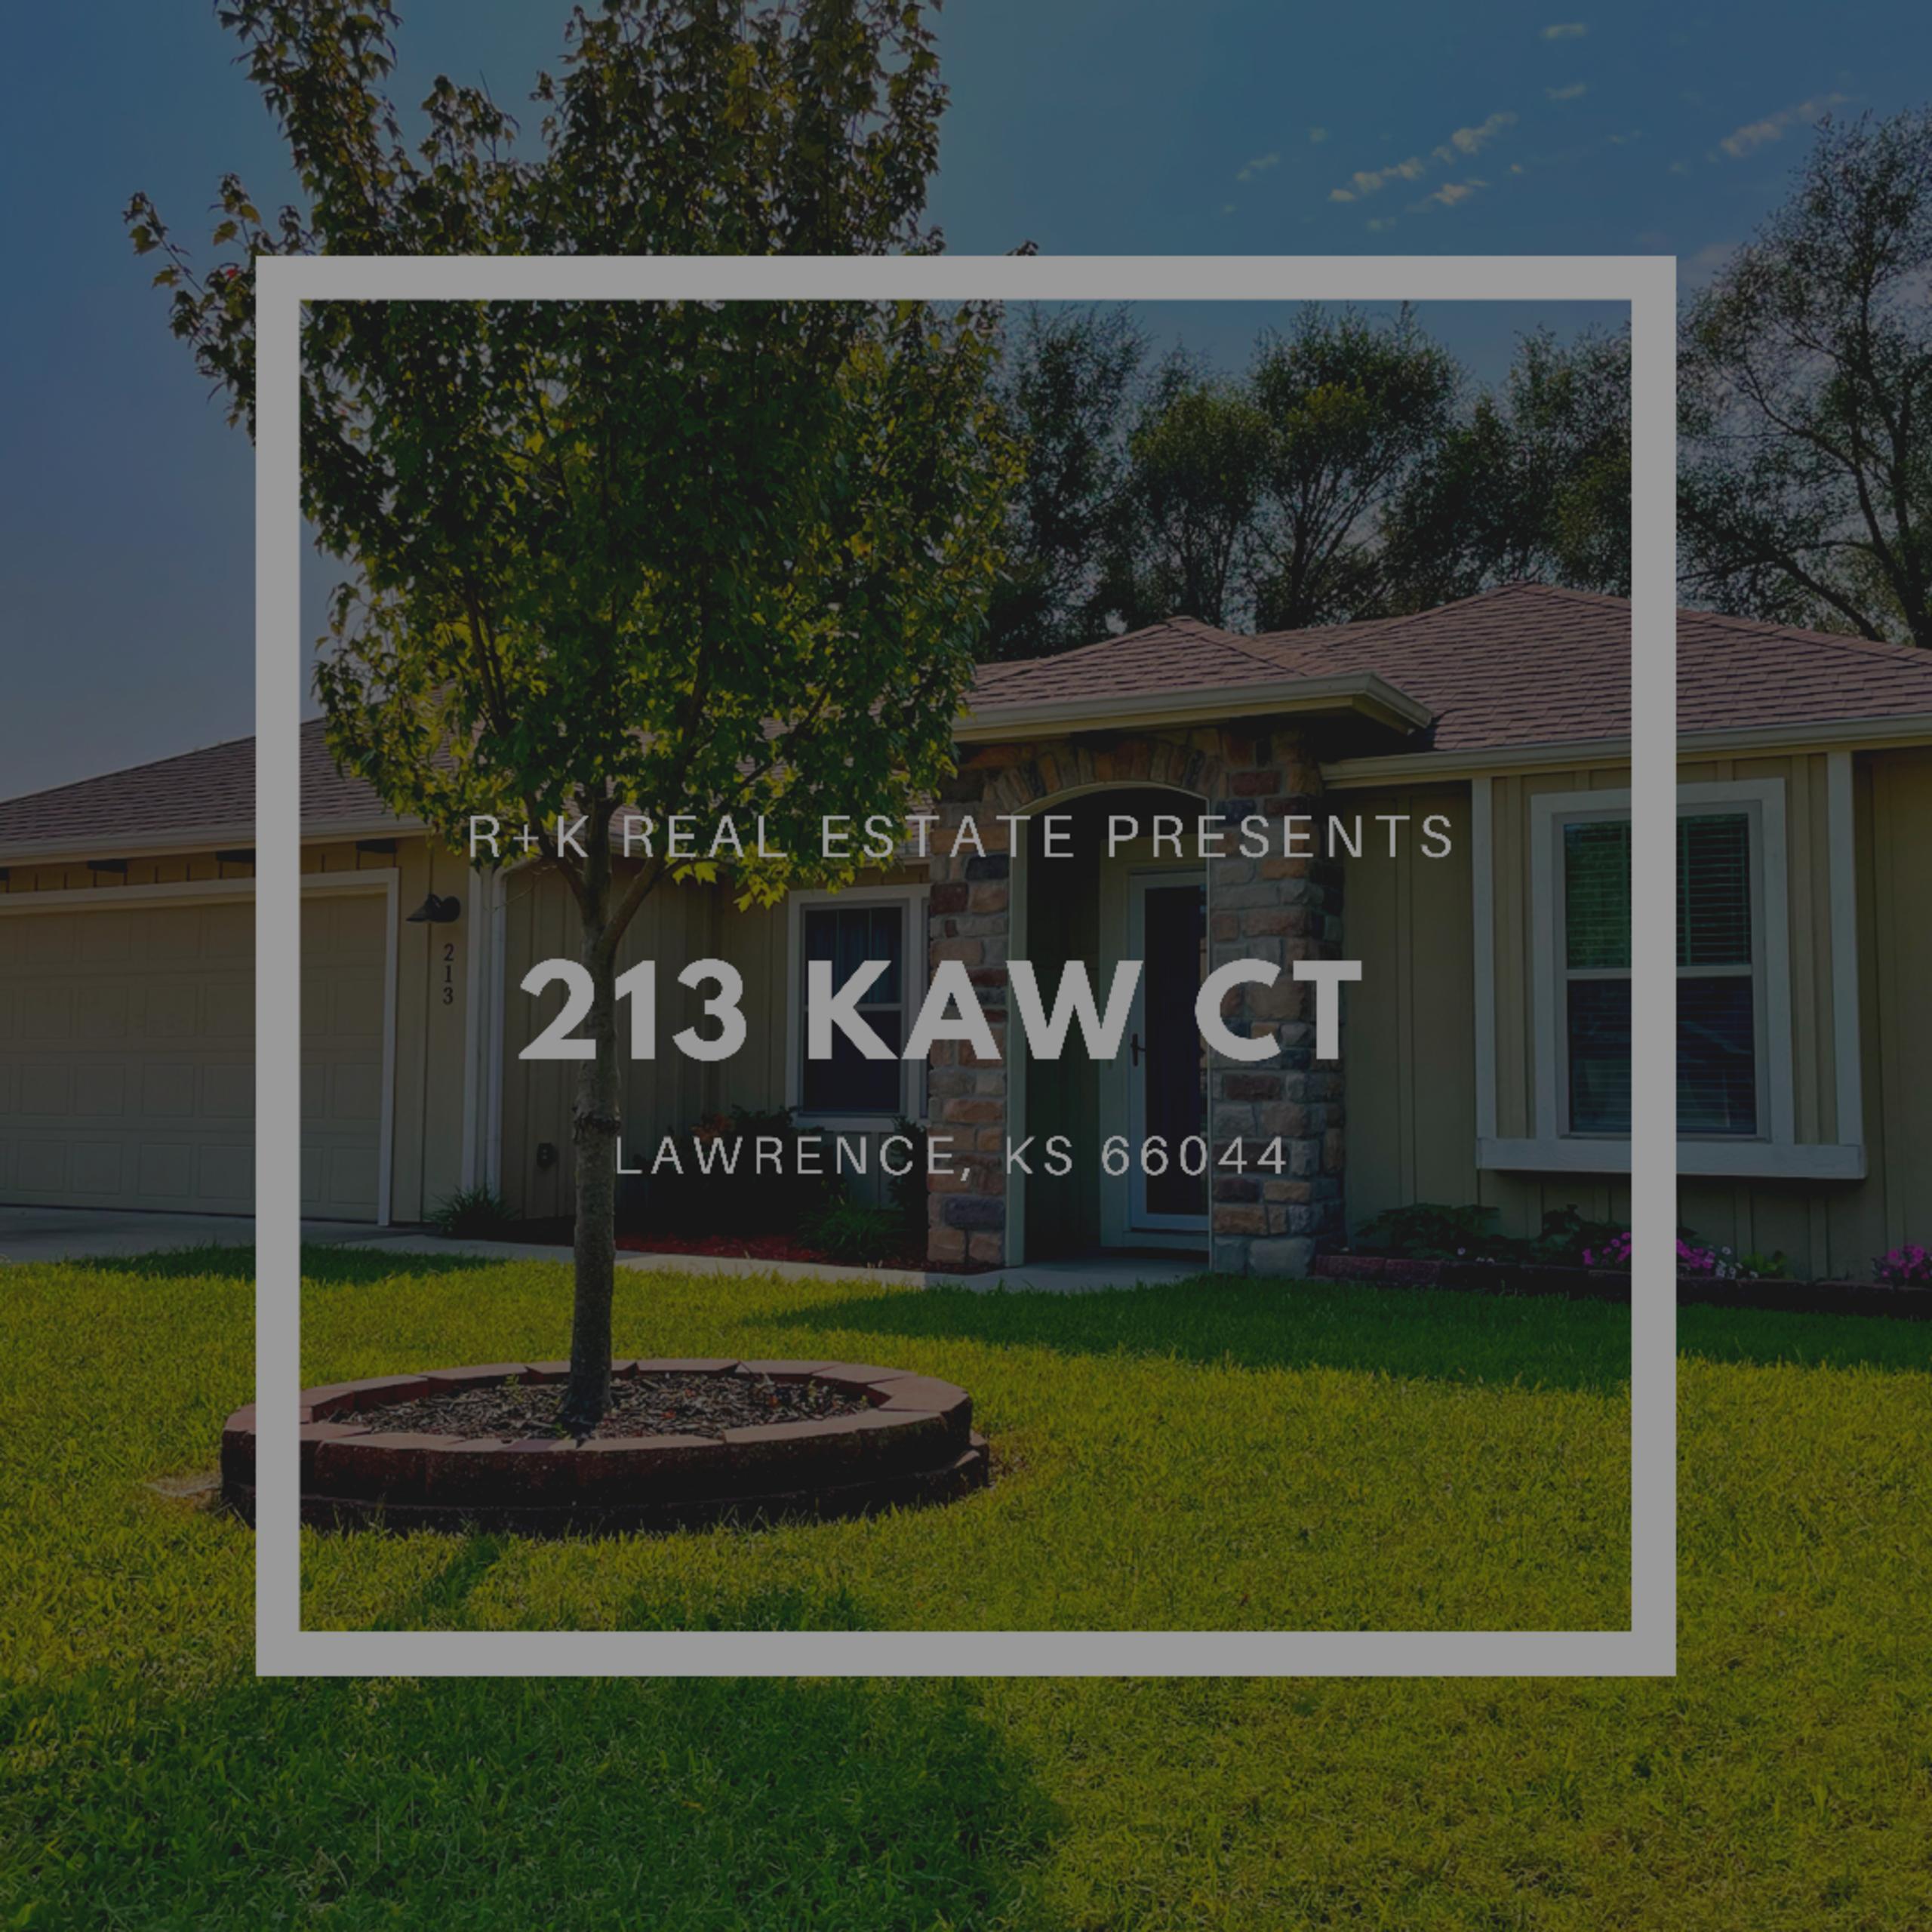 213 Kaw Ct. Lawrence, KS 66044